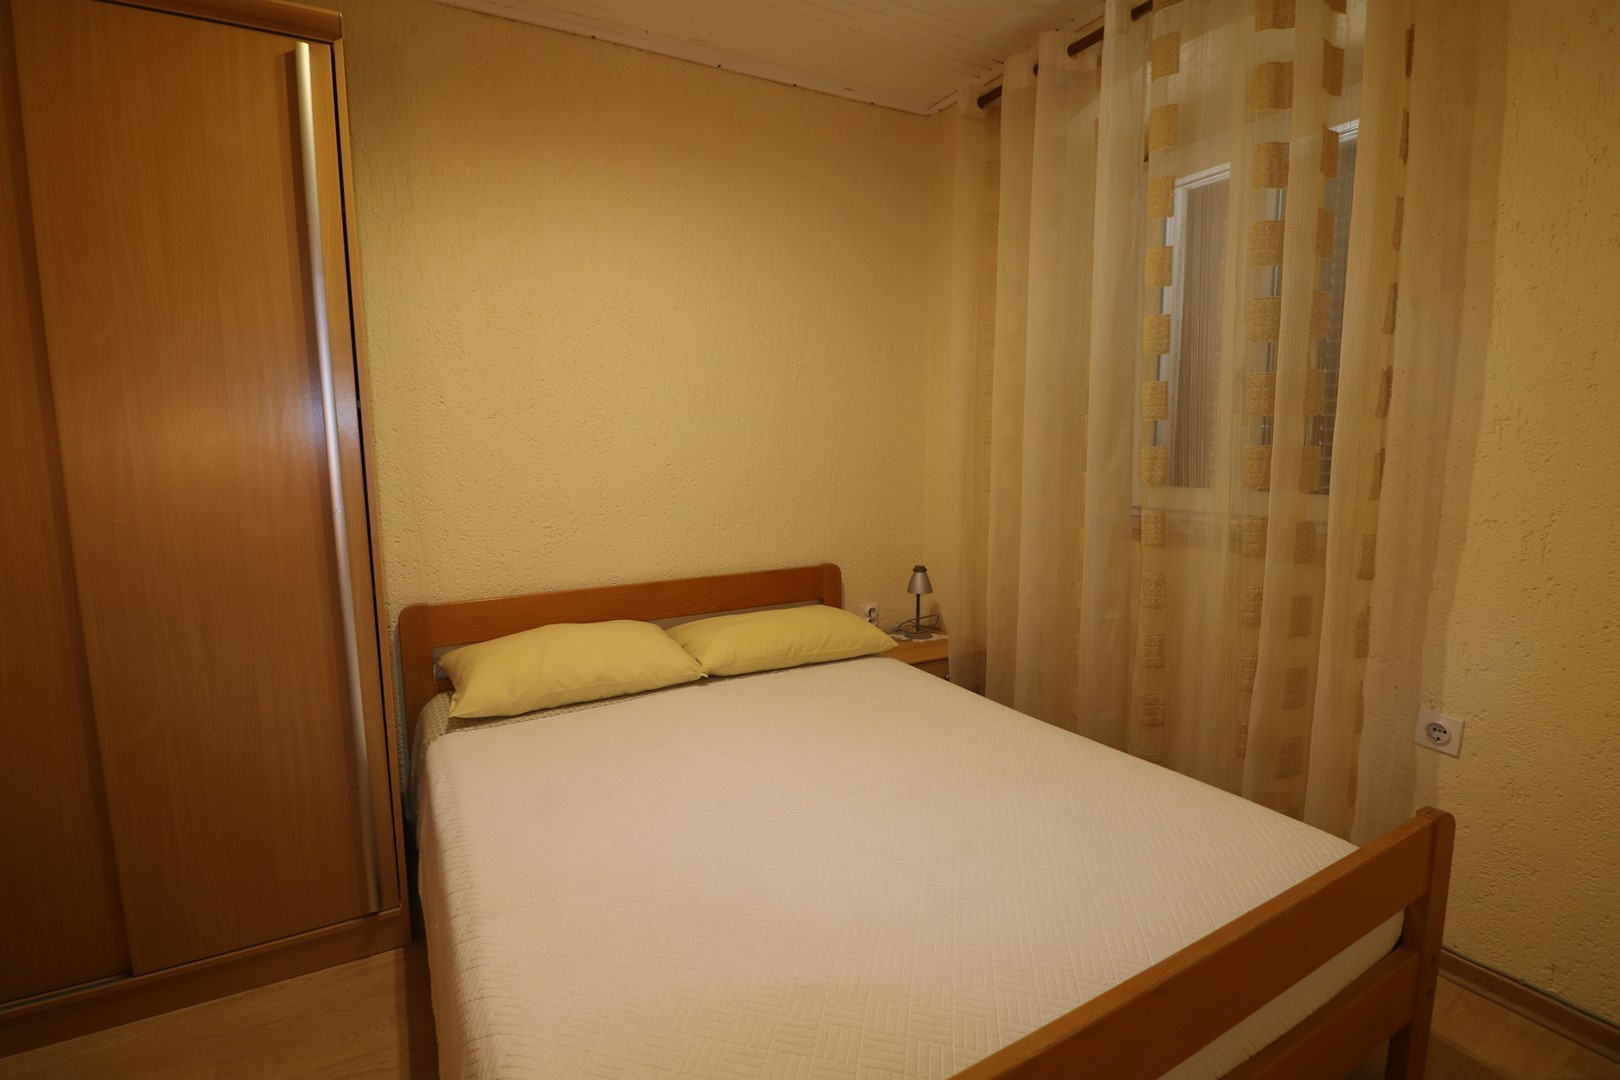 Ferienwohnung Apartments Ivo with the Sea View / Apartment Ivo with Beautiful Sea View (2616230), Baška, Insel Krk, Kvarner, Kroatien, Bild 12